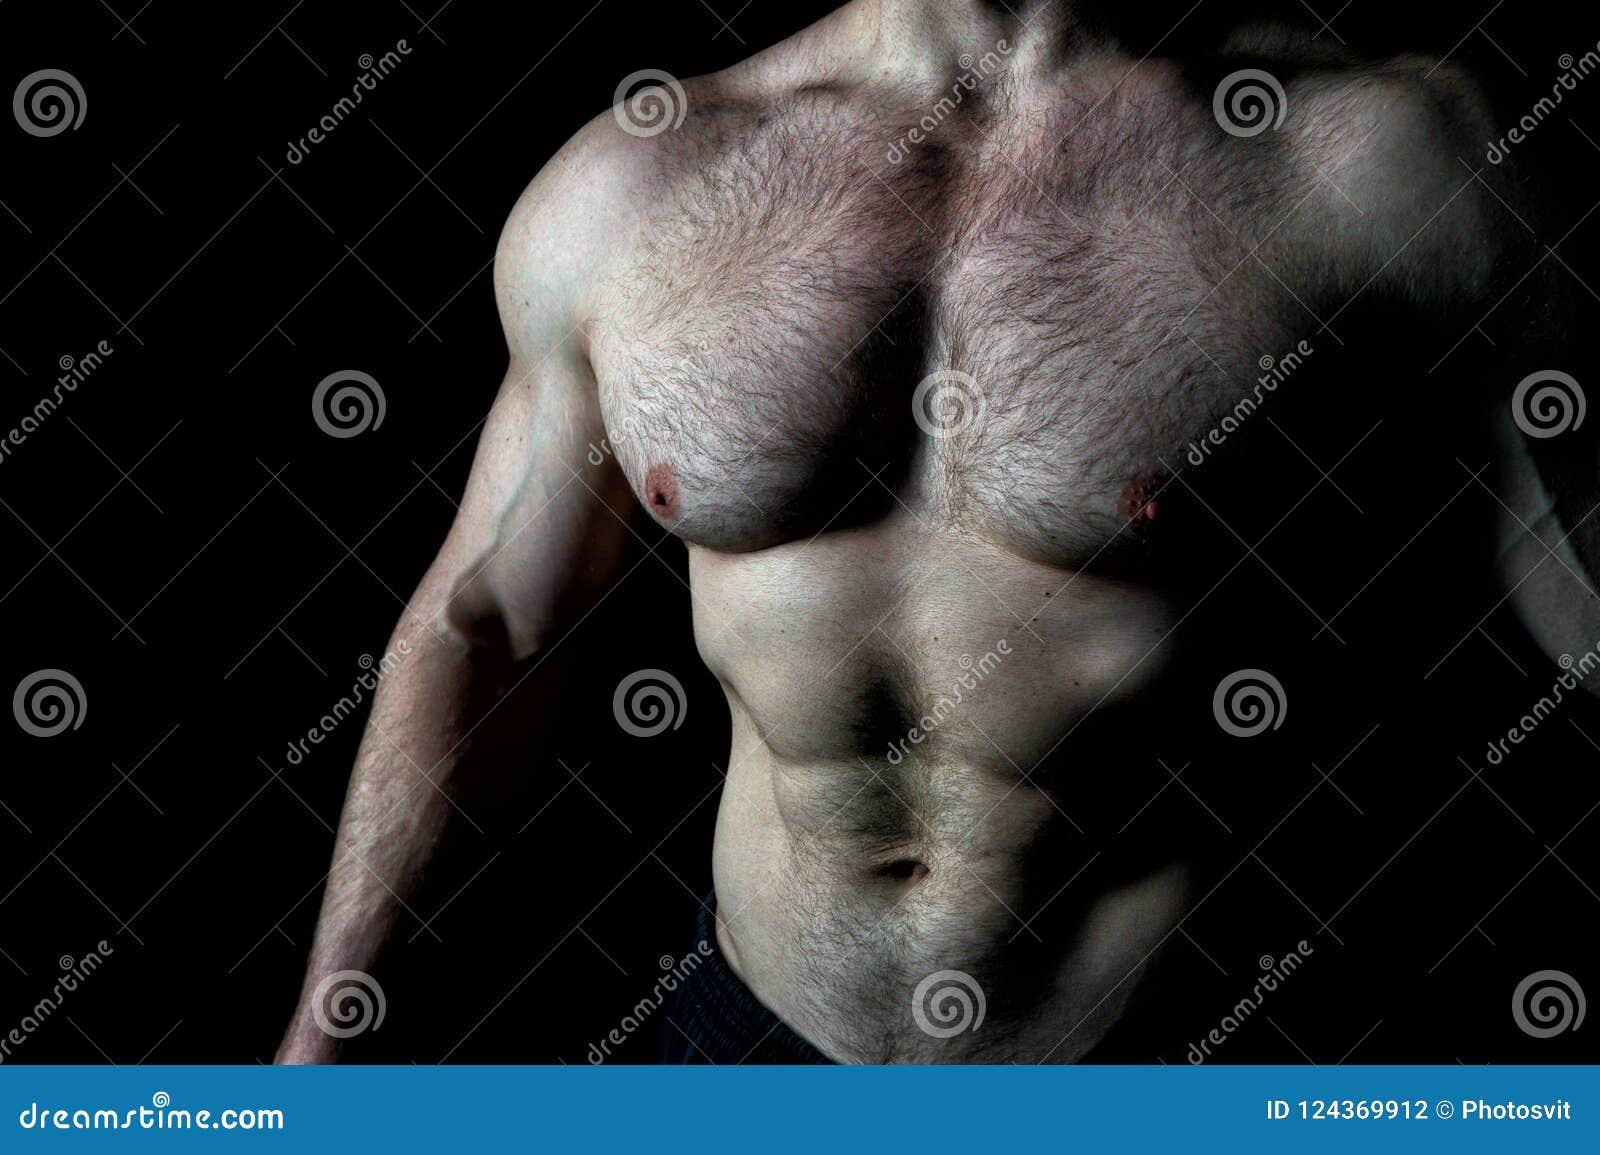 Hote naked sexlove vedio